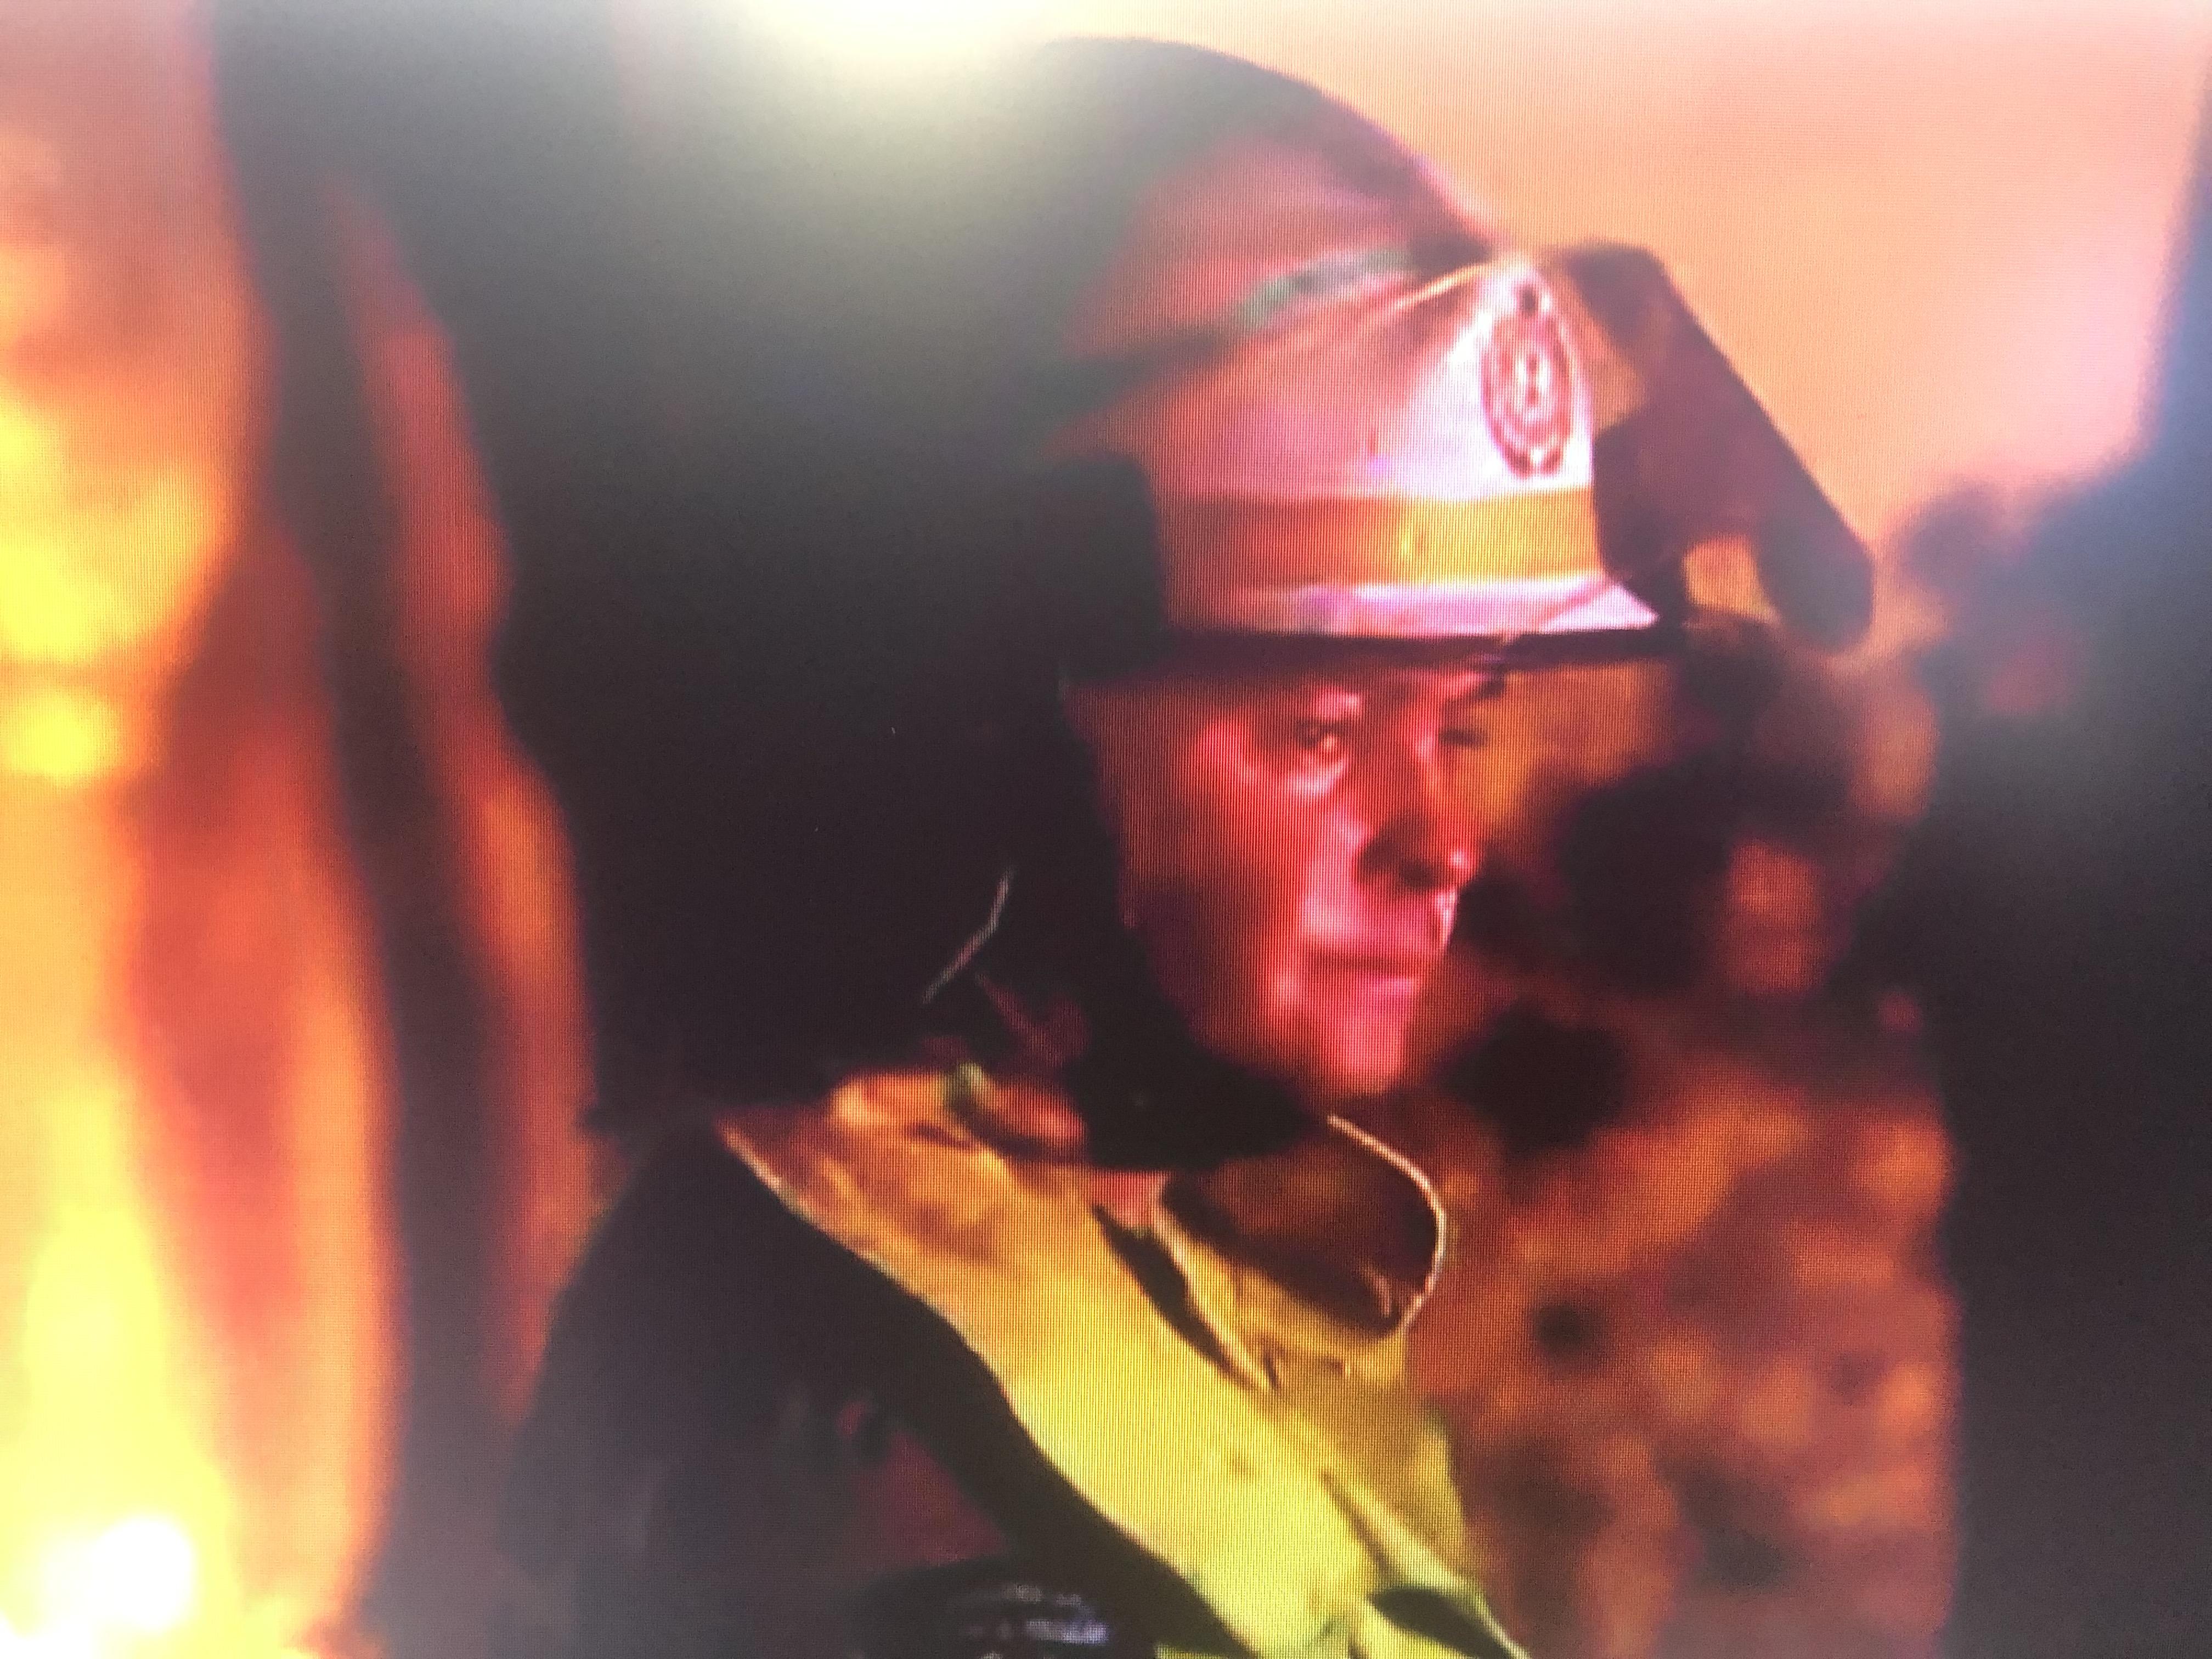 Still from ABC TV coverage of recent Australian bushfires